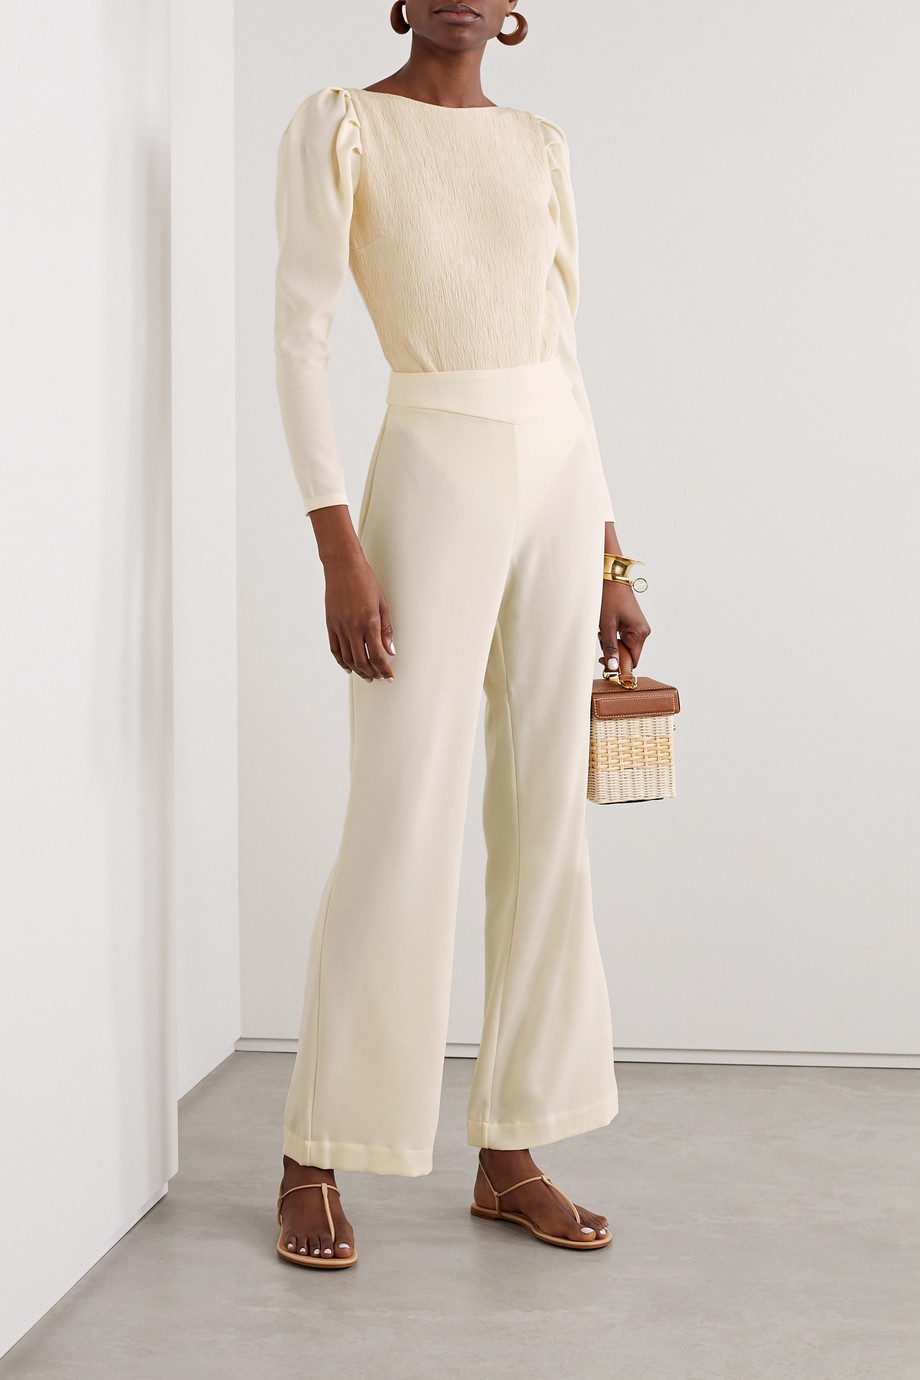 Johanna Ortiz Paintery crinkled stretch-crepe bodysuit